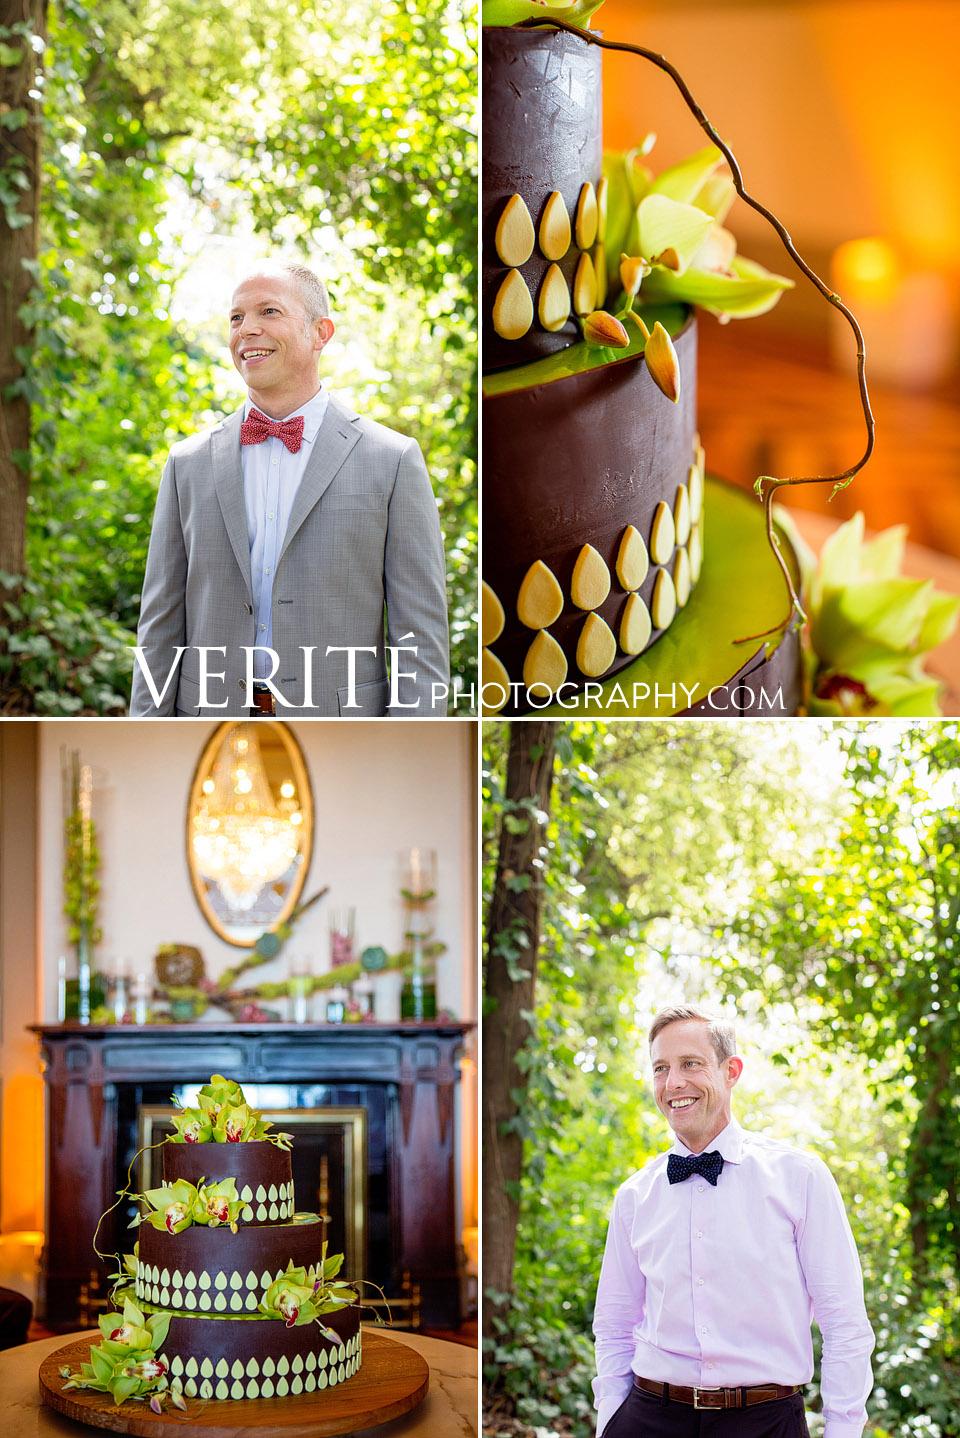 007_san_francisco_wedding_photographer_PatJef_Verite_comp001.jpg